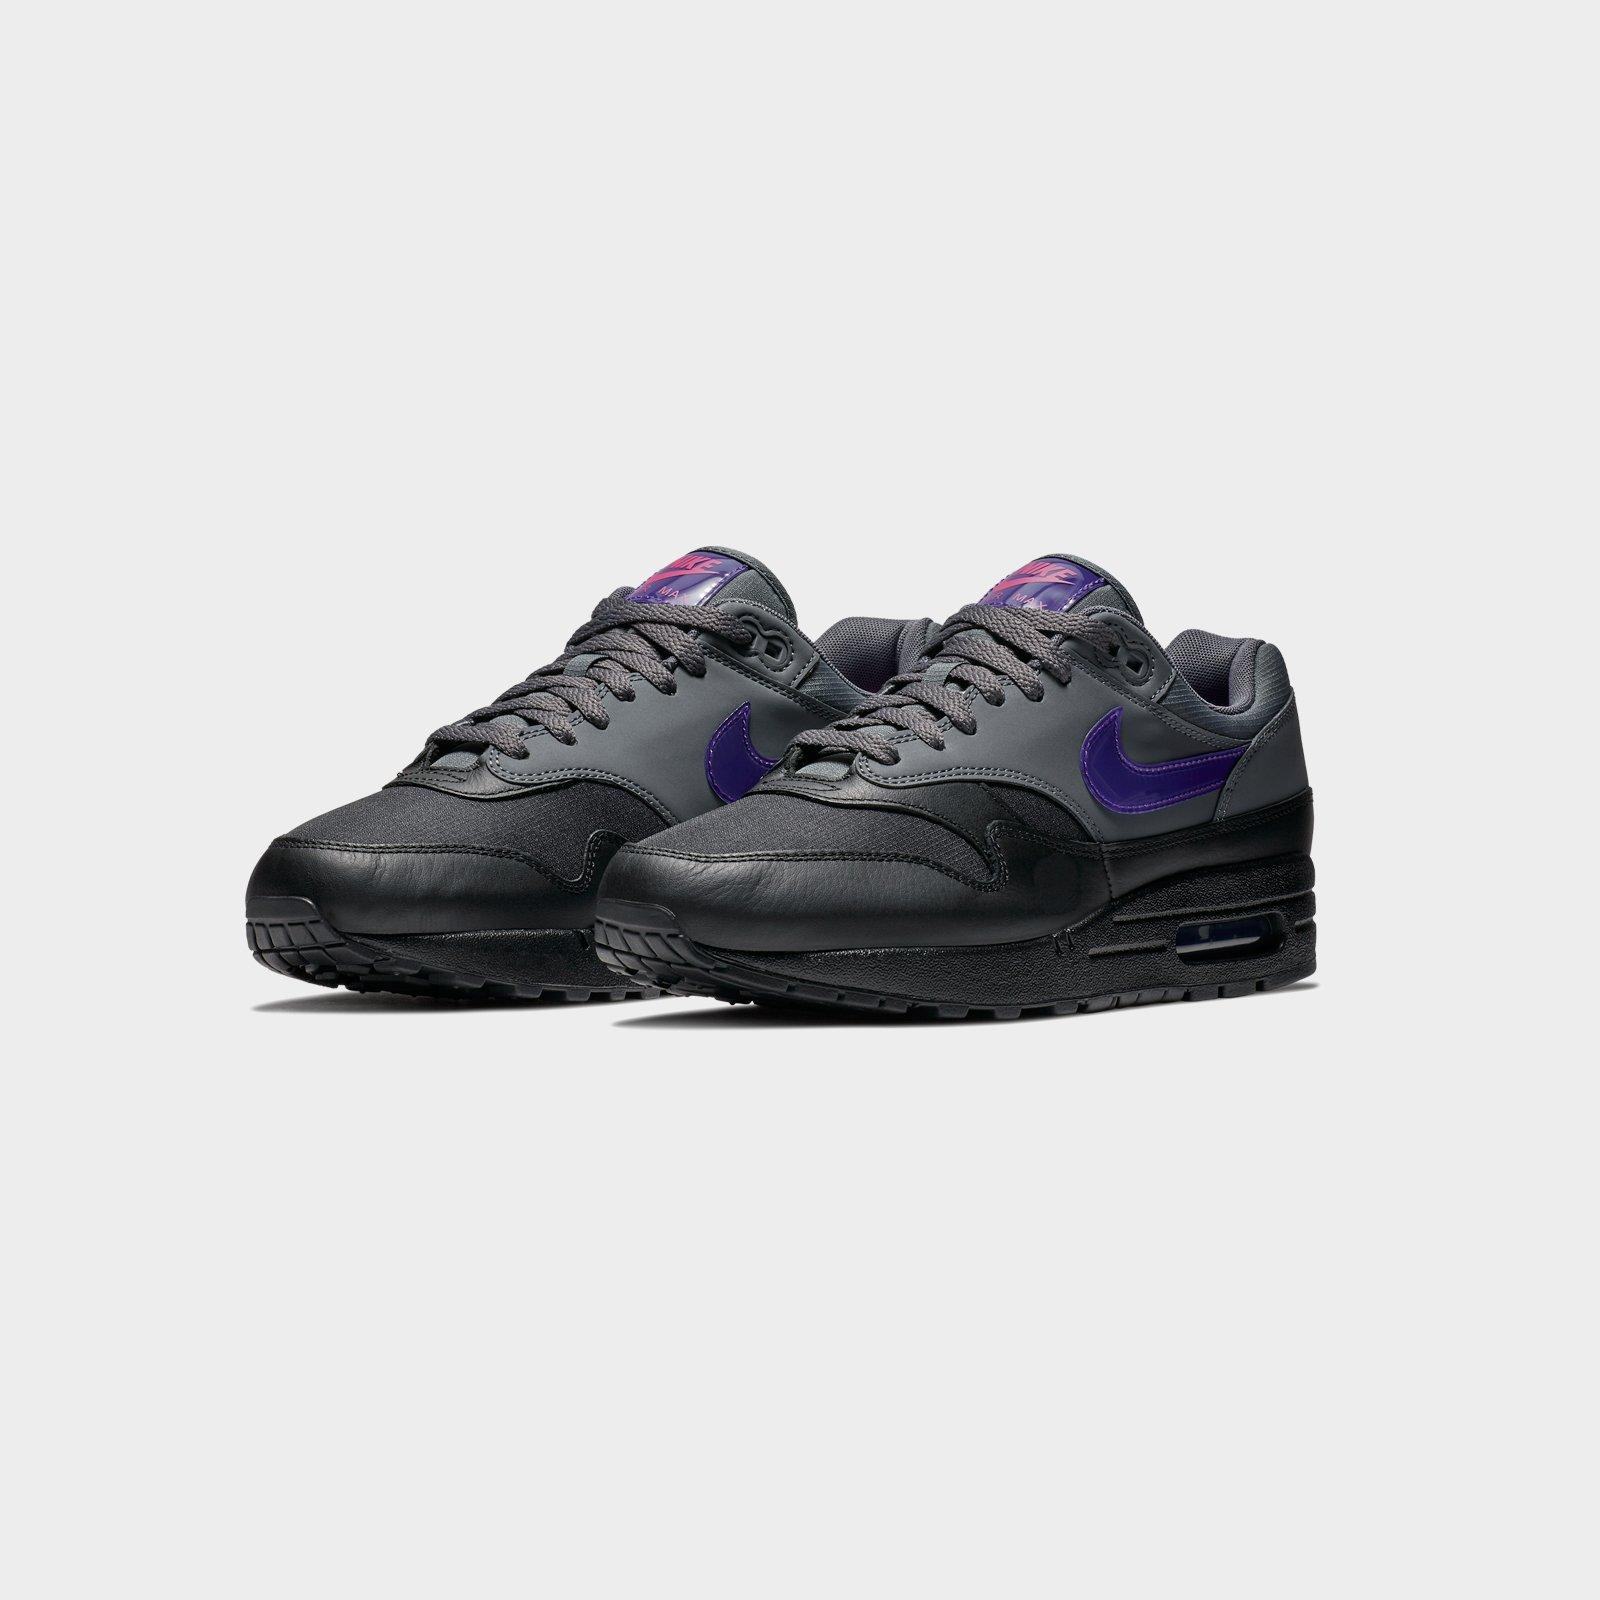 on sale ac95e 542b0 Nike Air Max 1 - Ar1249-002 - Sneakersnstuff   sneakers   streetwear online  since 1999